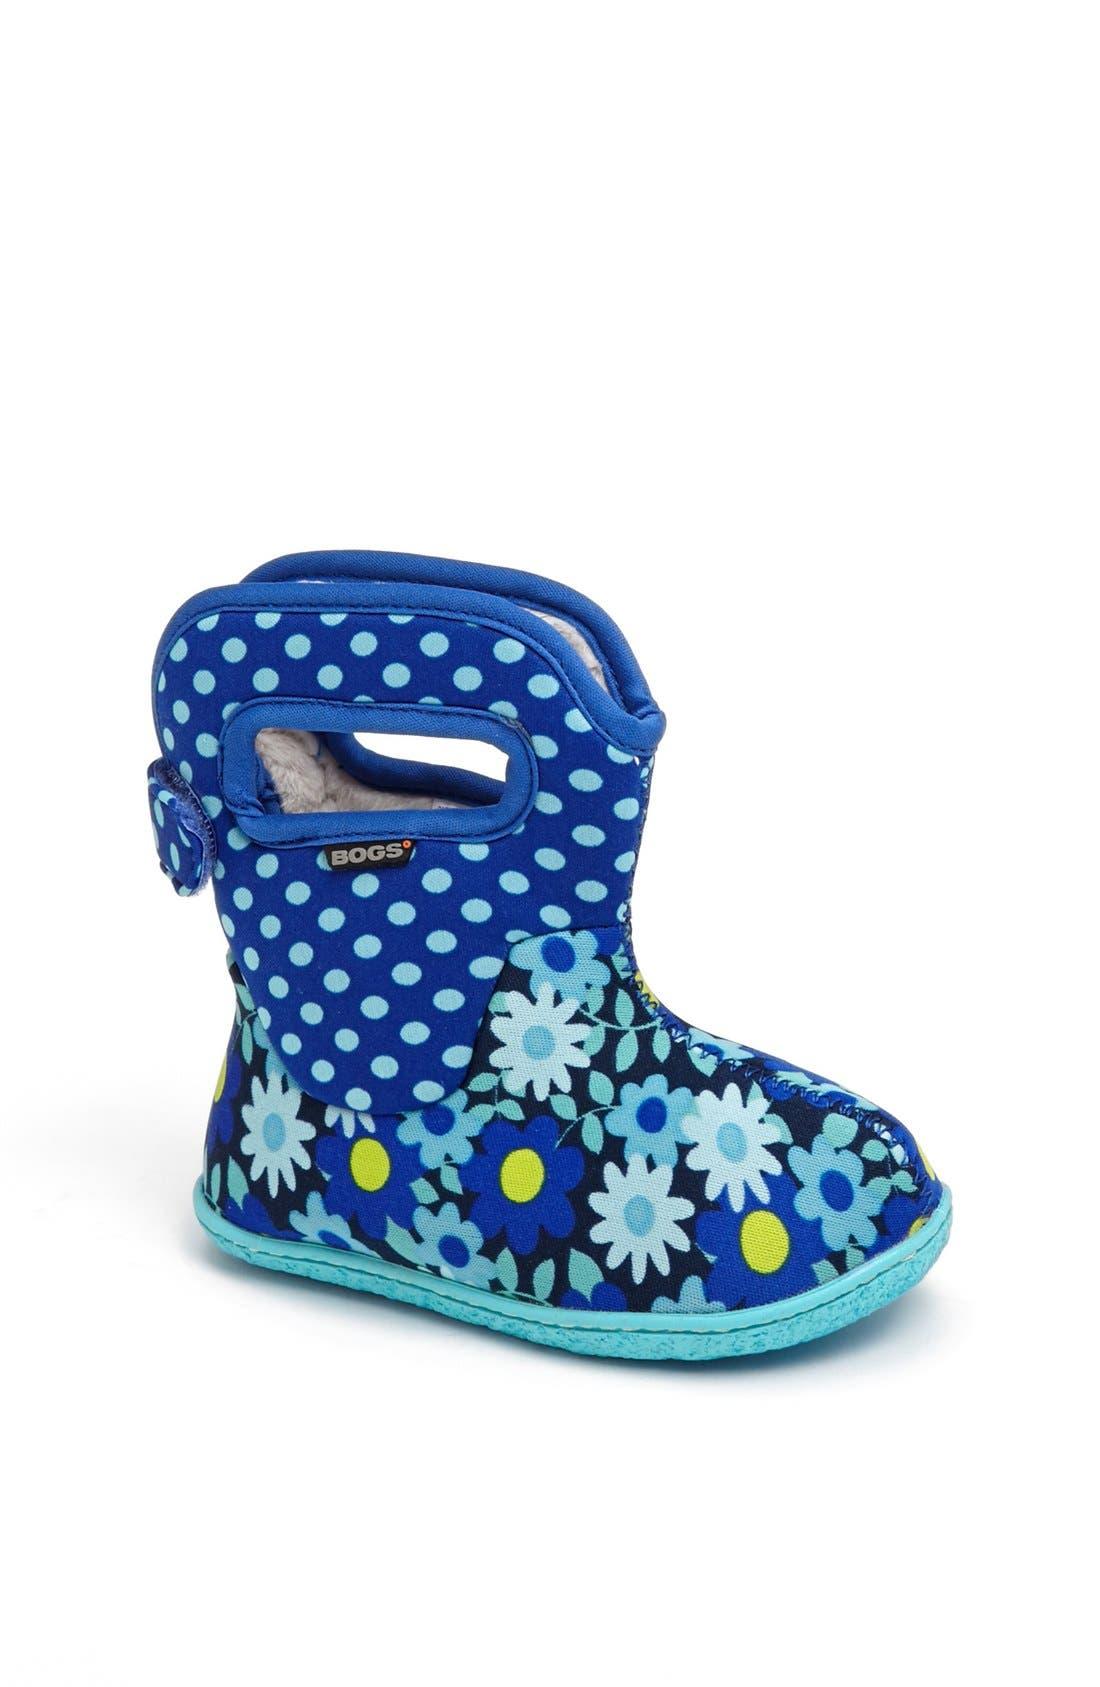 Alternate Image 1 Selected - Bogs 'Baby Bogs - Daisy Dots' Waterproof Boot (Baby, Walker & Toddler)